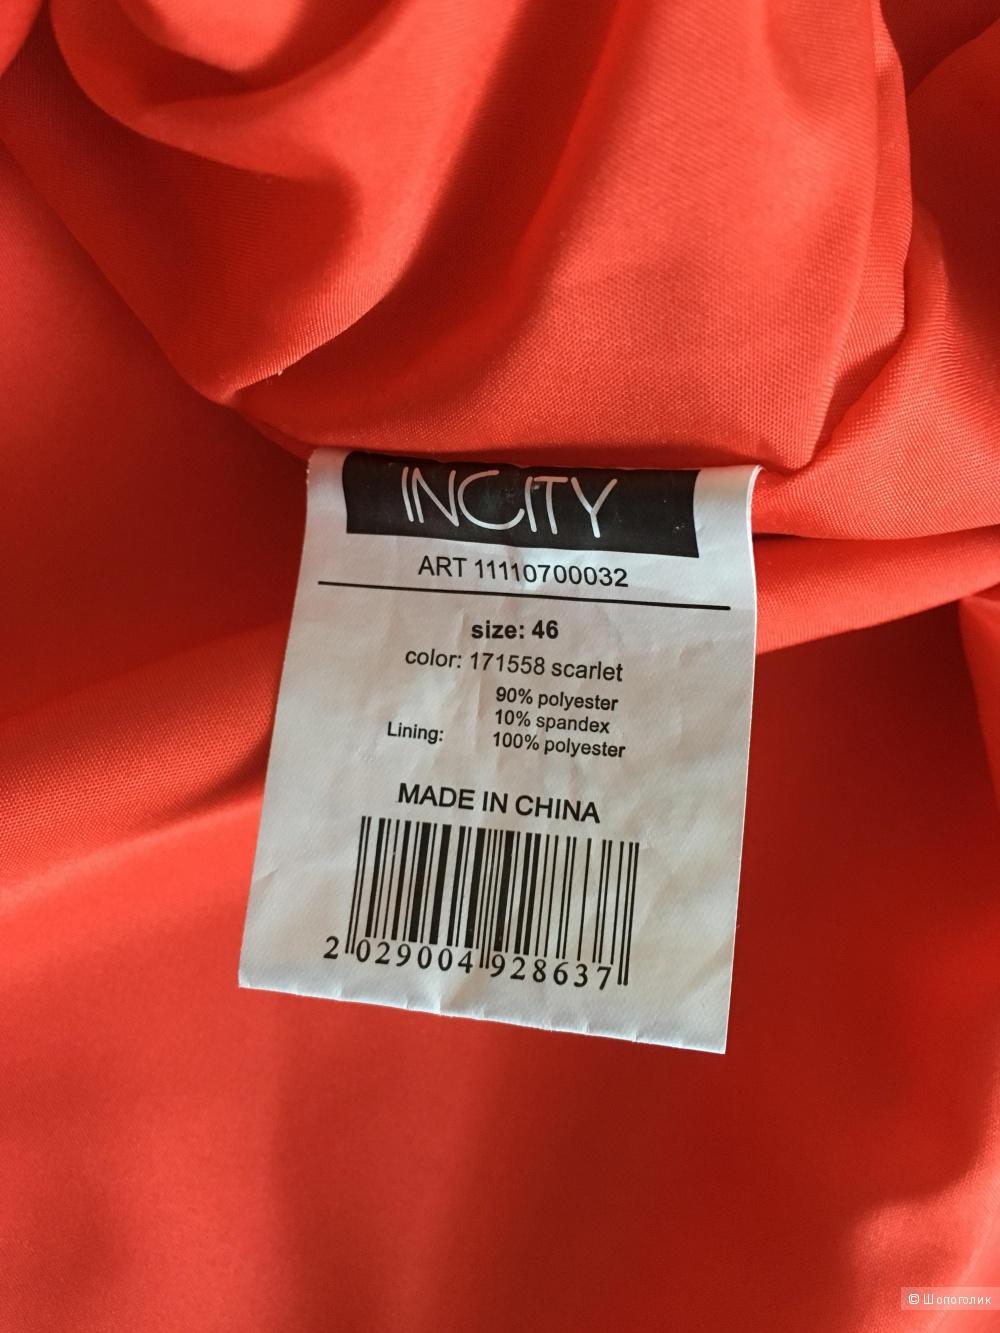 Комплект блузка и юбка Incity, 44-46 размер